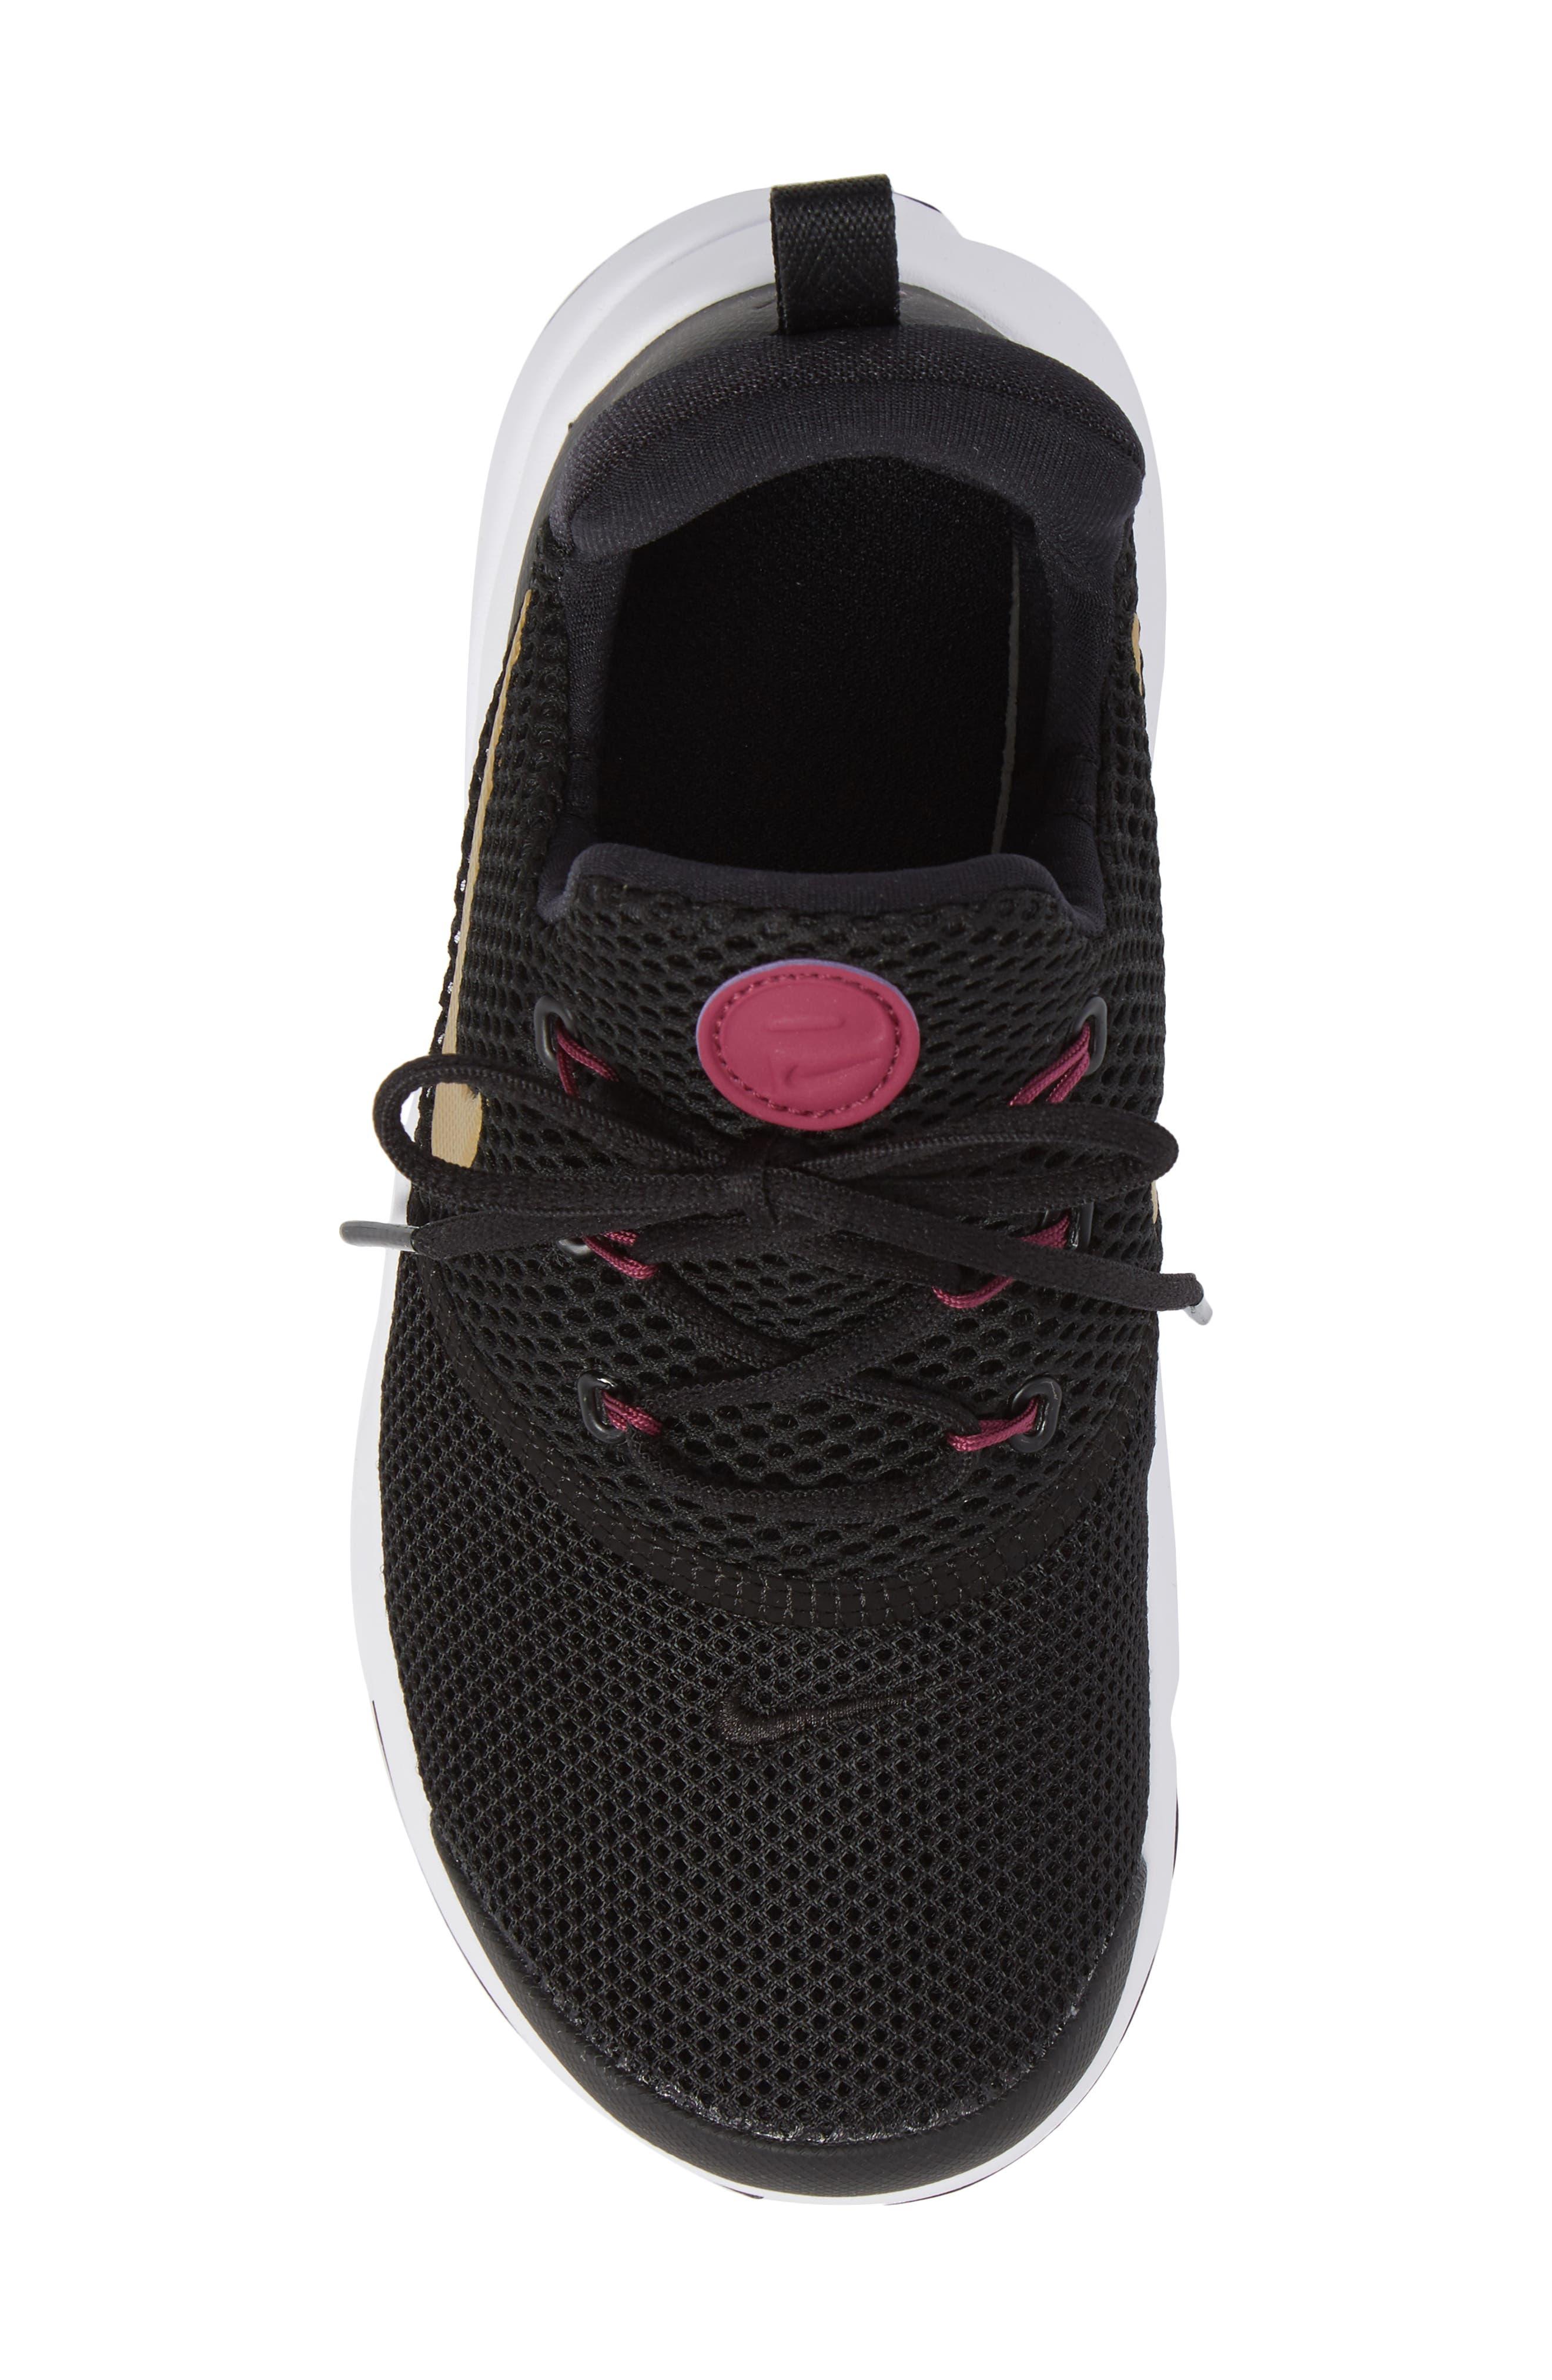 Presto Fly PS Sneaker,                             Alternate thumbnail 5, color,                             Black/ Gold